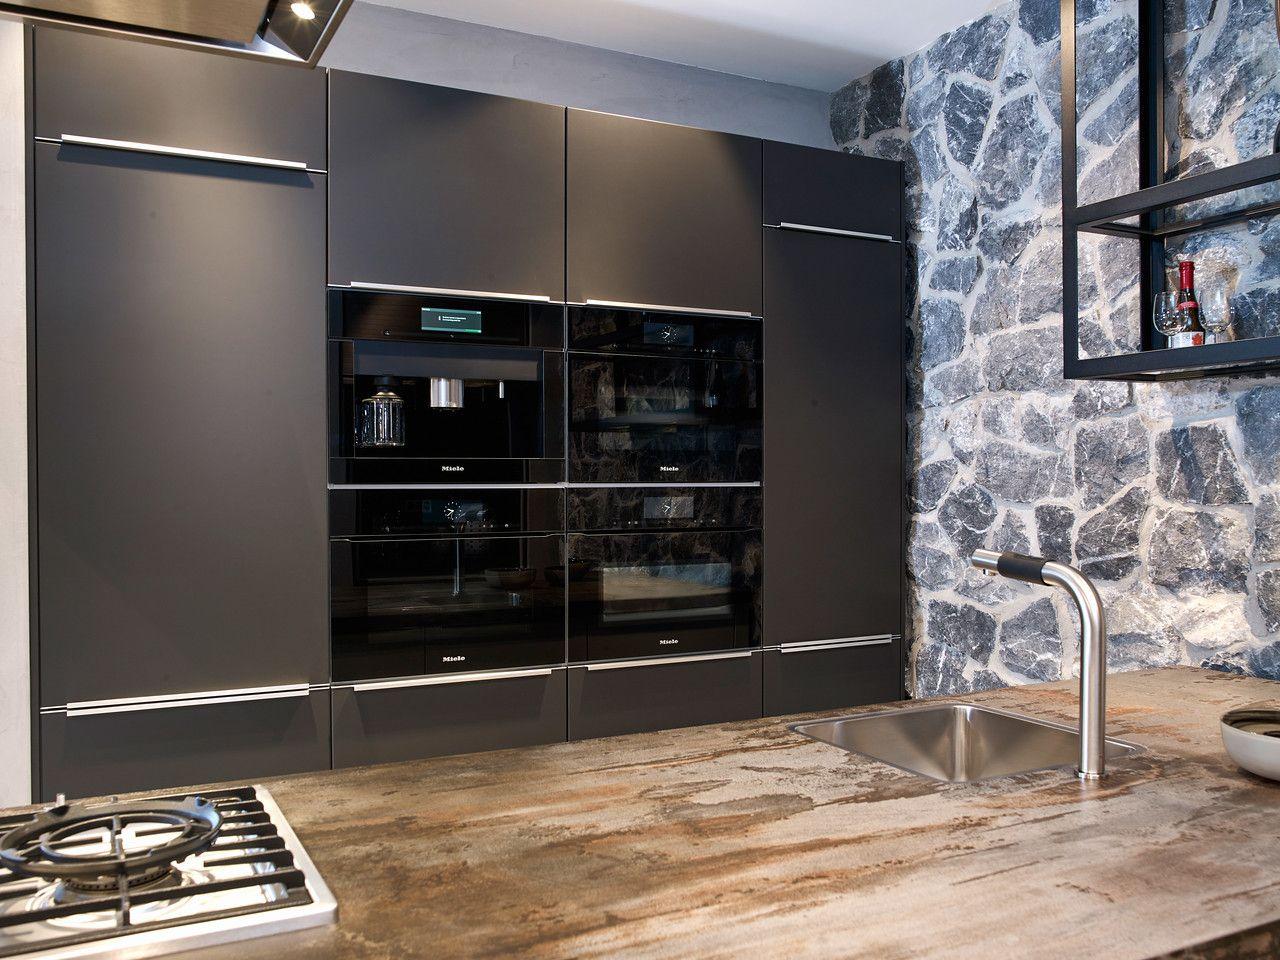 Next 125 NX130 / NX500 kopen? Tieleman Keukens Moderne